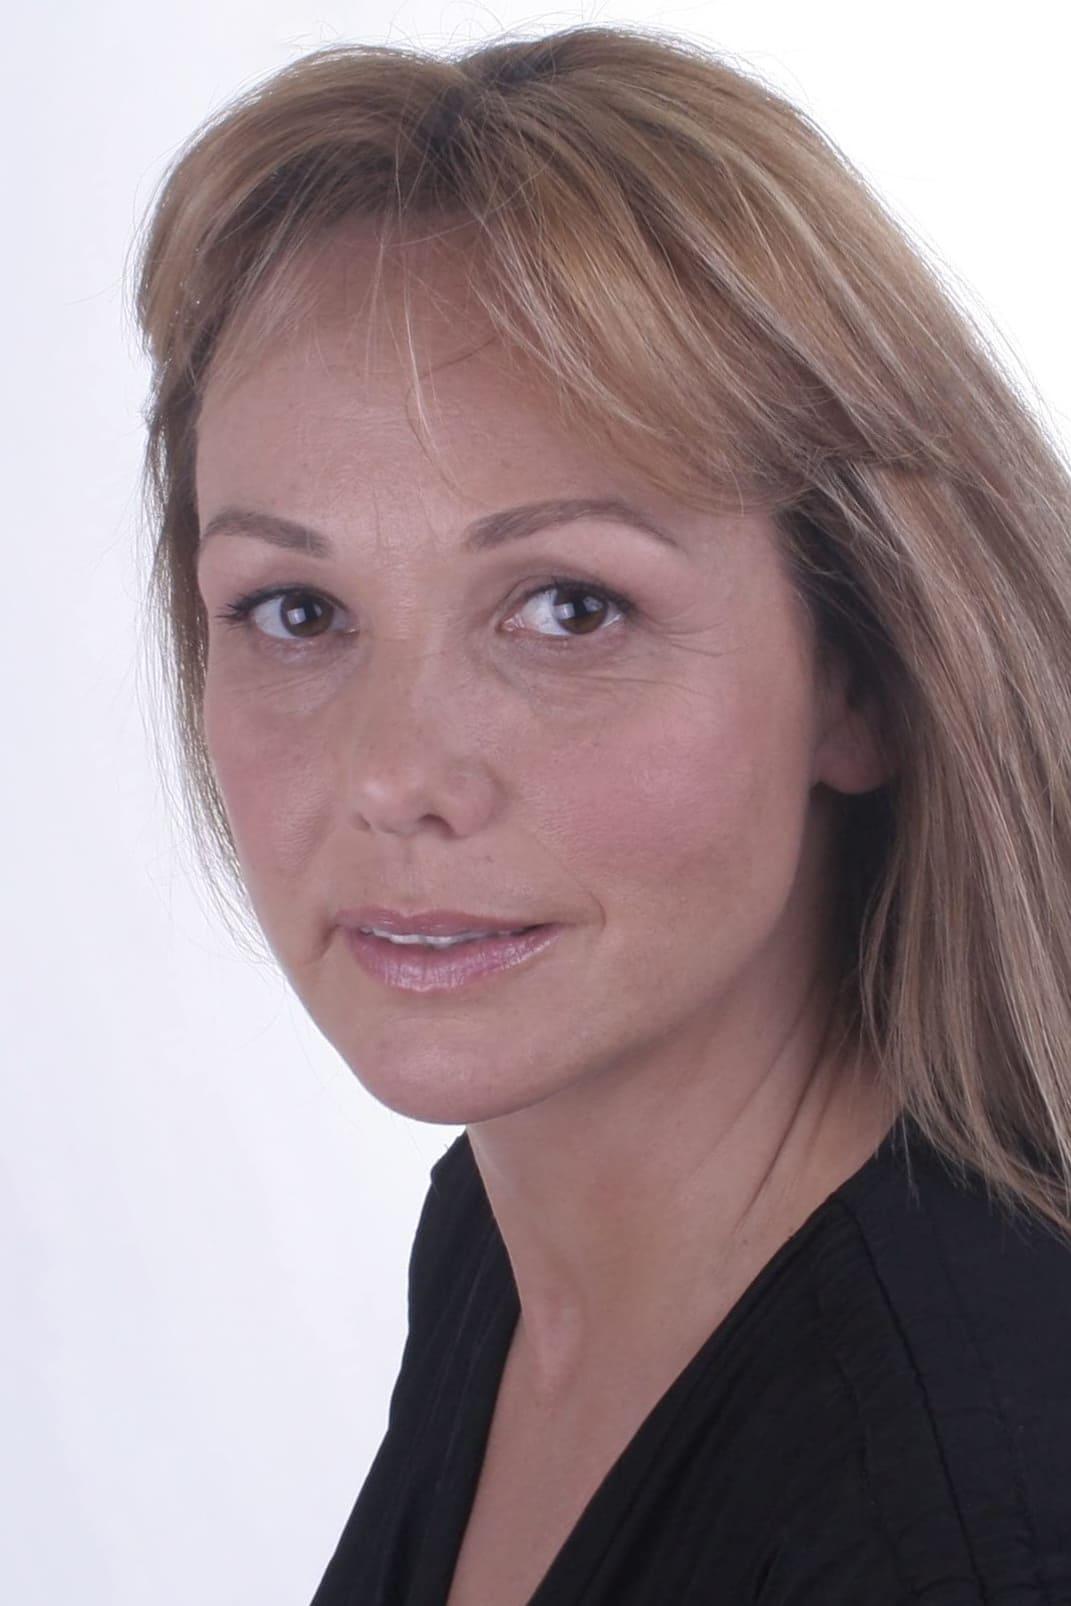 Martina Adamcová